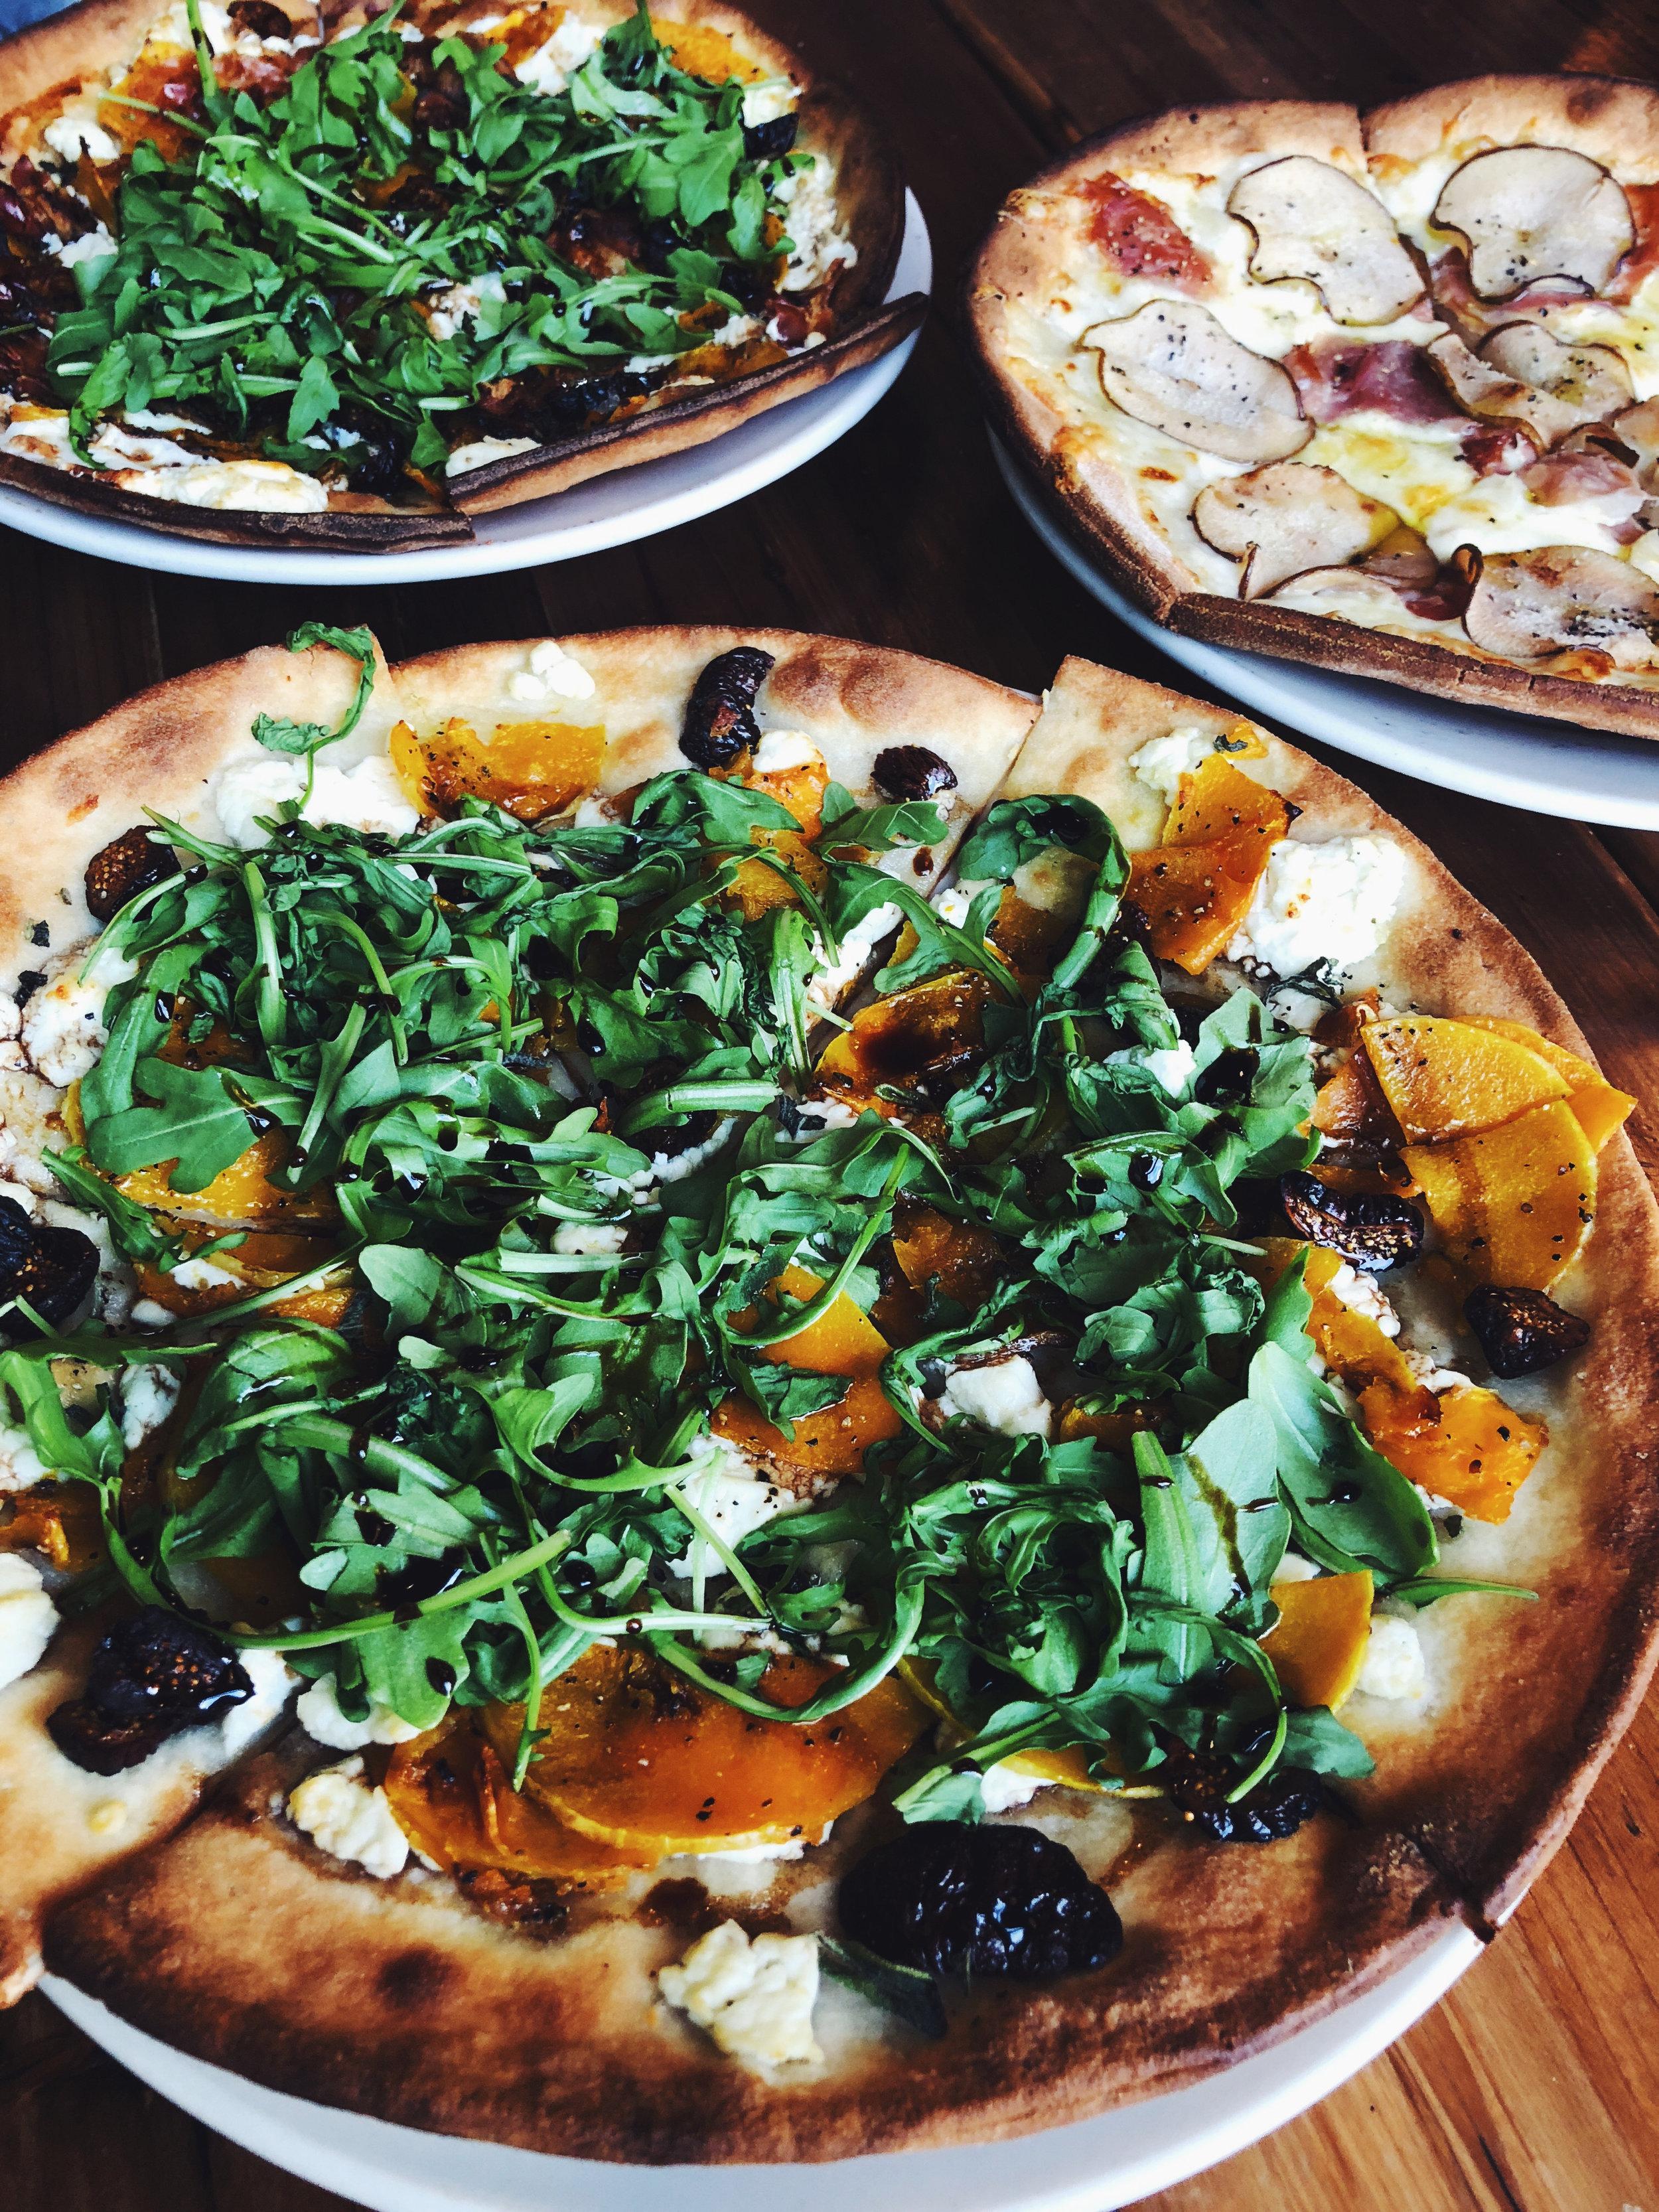 KATIE'S PIZZA & PASTA